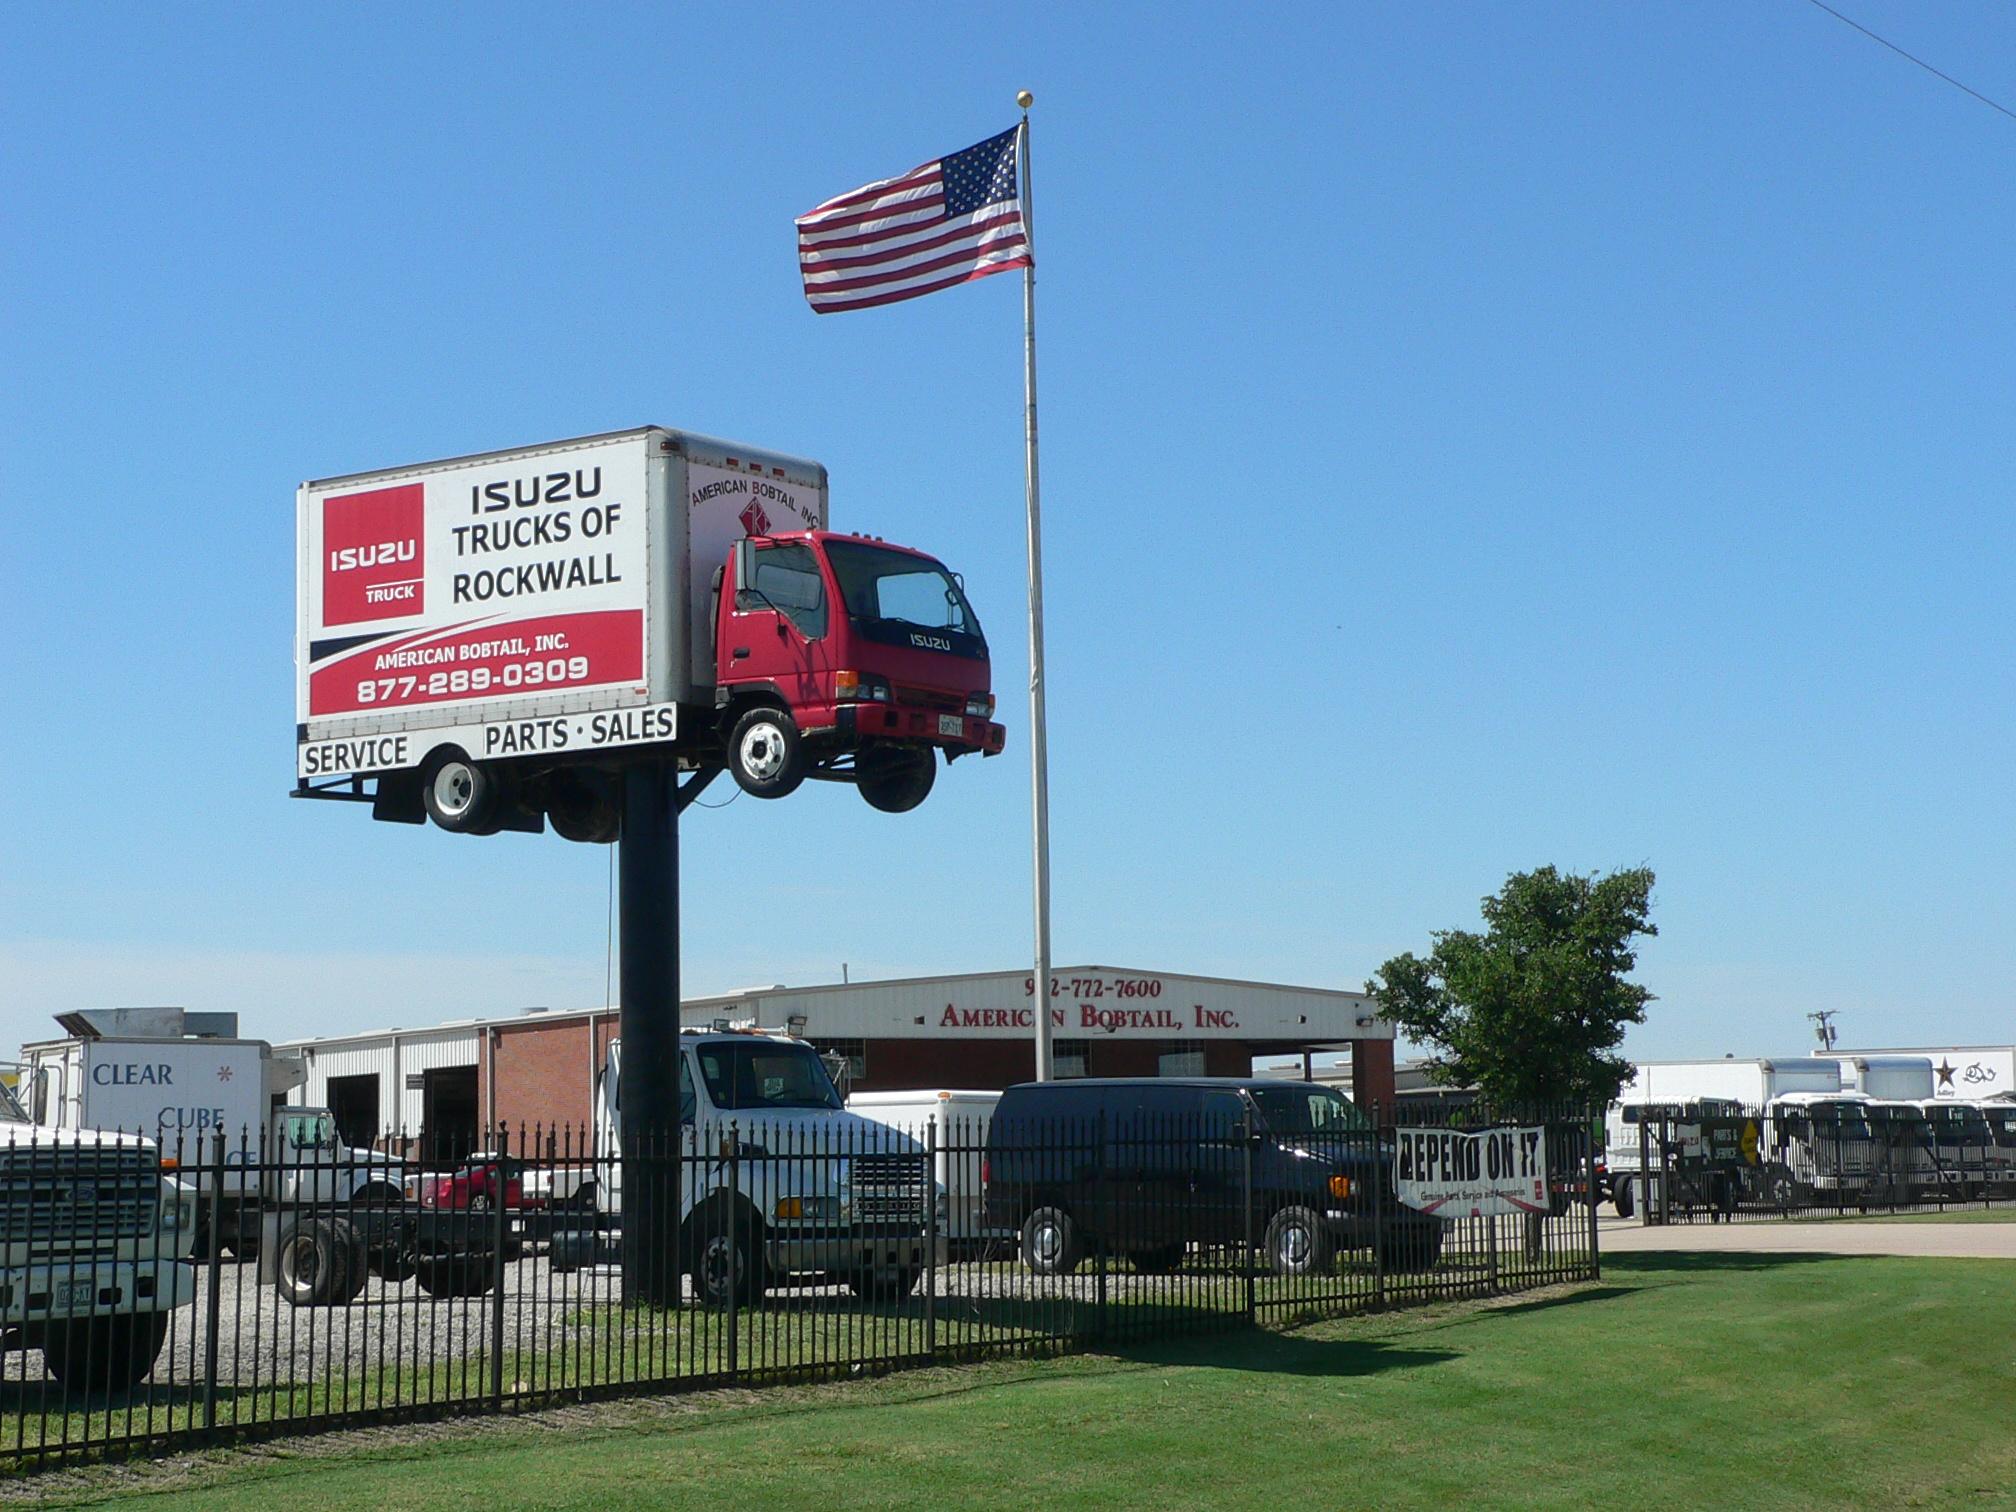 Superb American Bobtail Inc. Dba Isuzu Trucks Of Rockwall  Rockwall, TX.